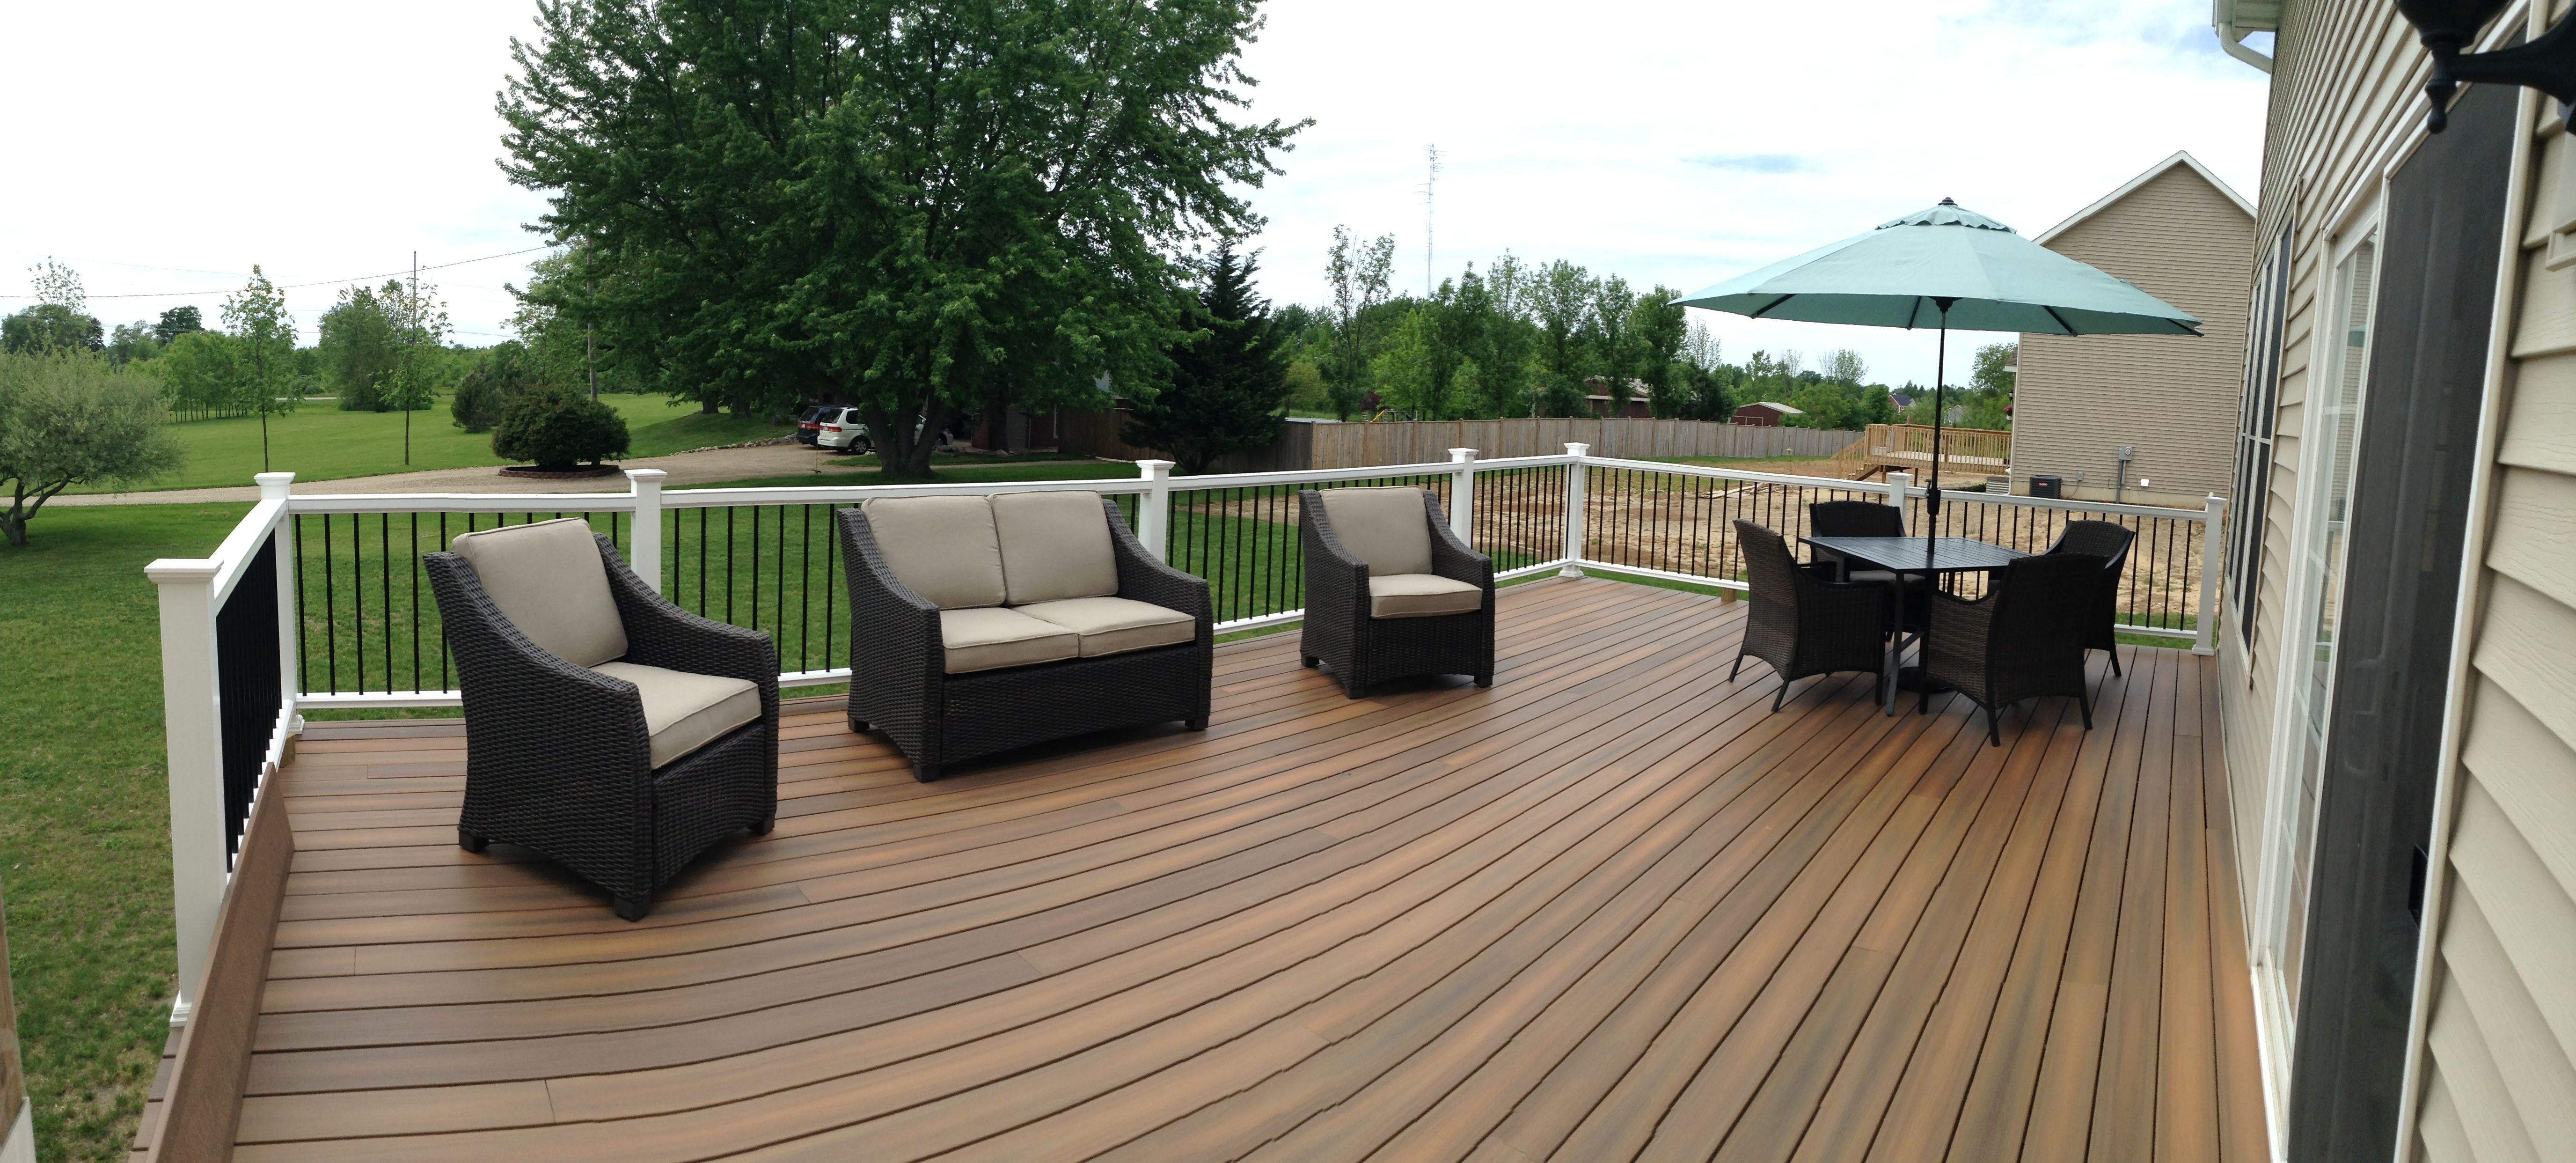 Fiberon Horizon Ipe Love My Deck Backyard Lanscaping